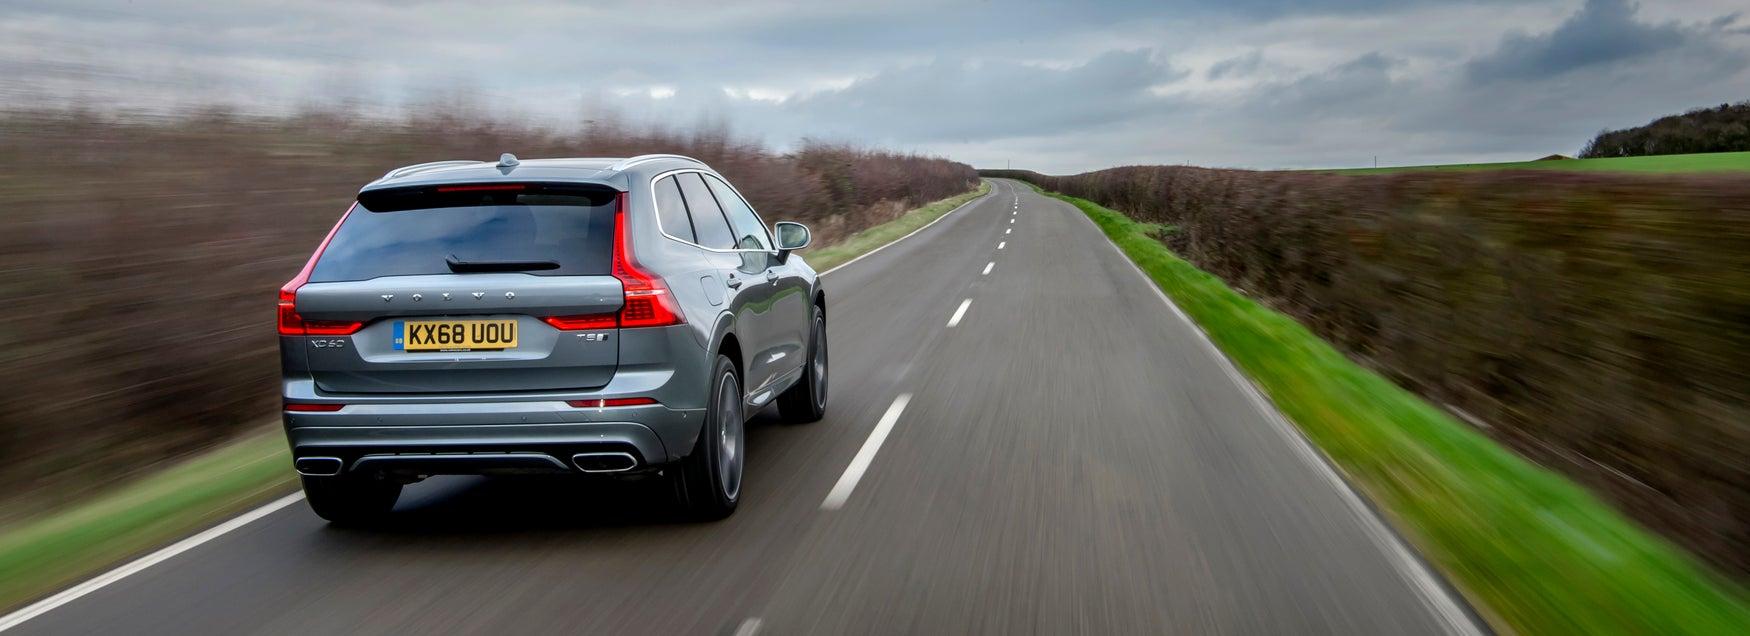 Volvo XC60 lane assist